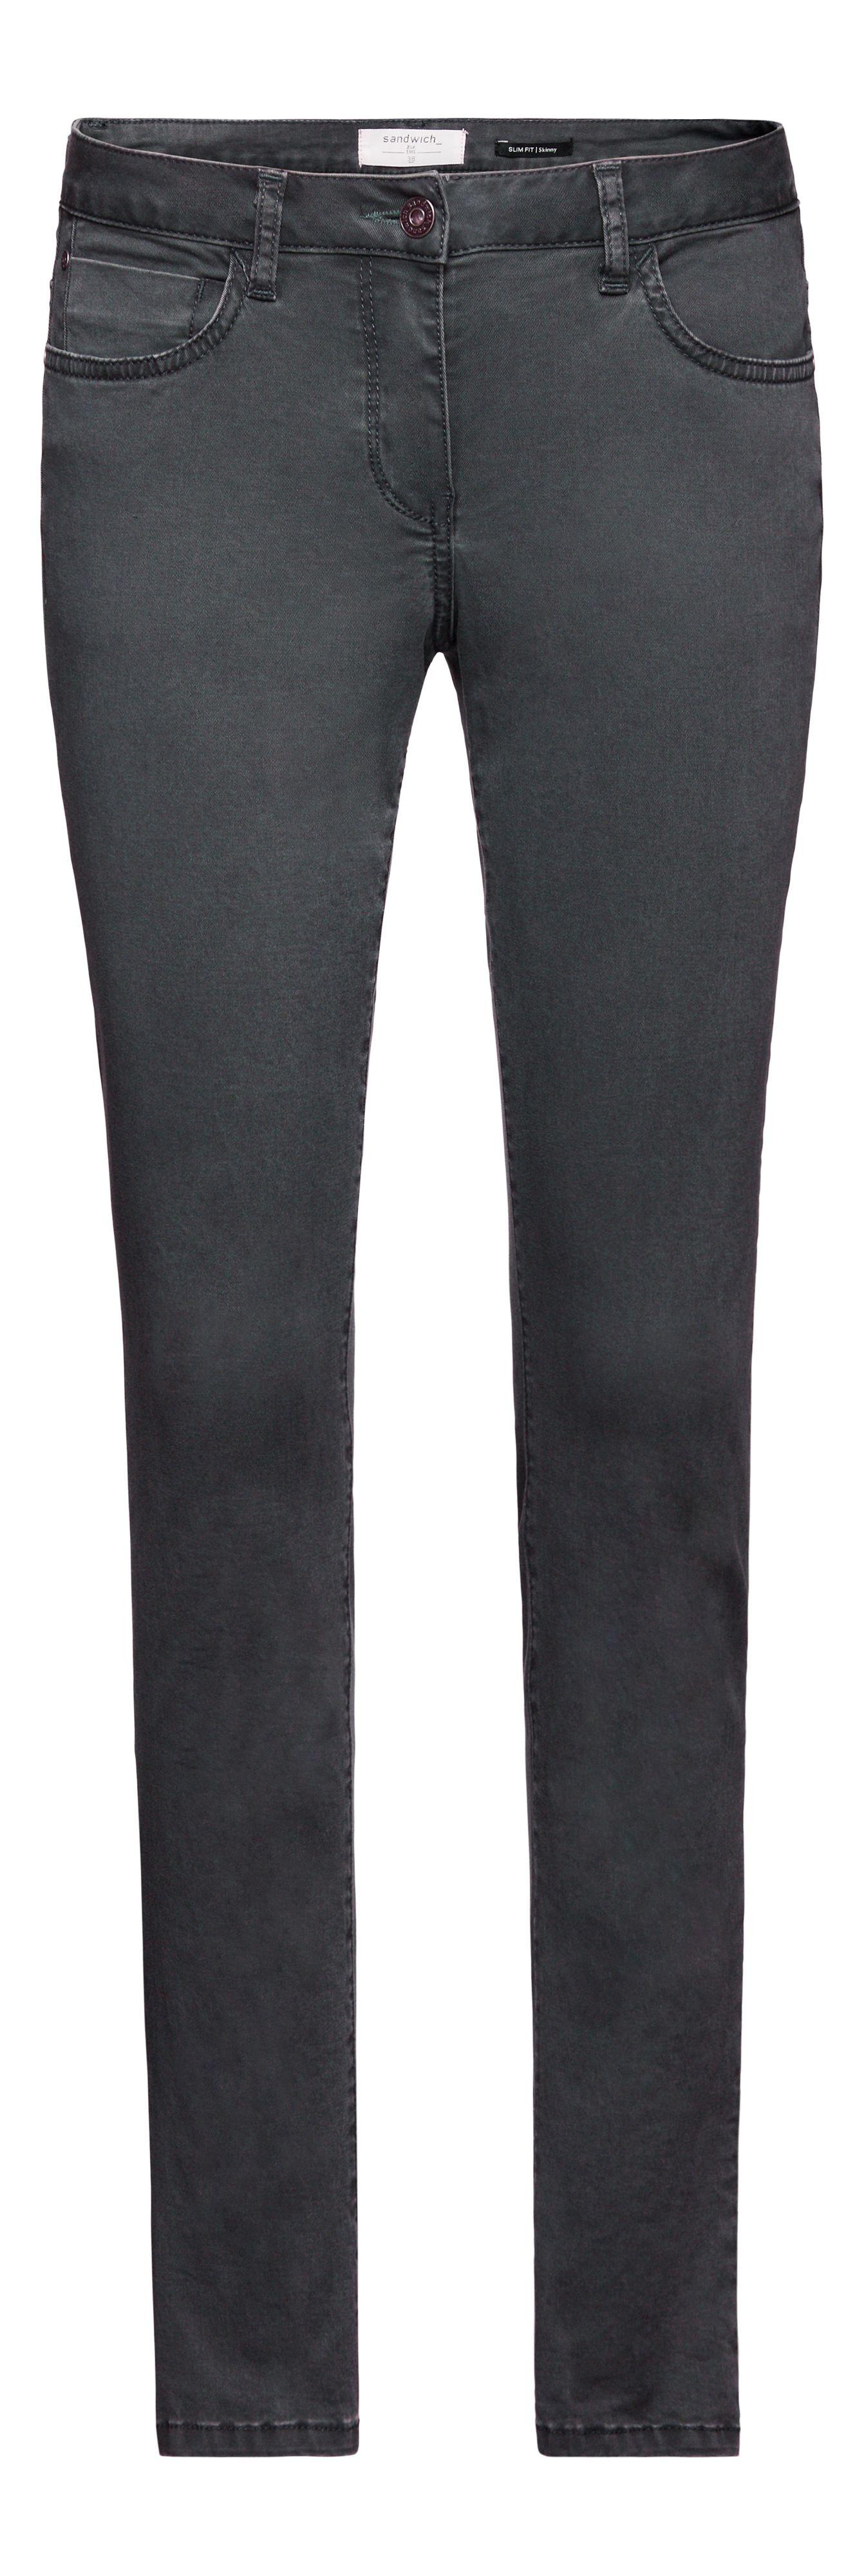 sandwich skinny jeans in gray lyst. Black Bedroom Furniture Sets. Home Design Ideas